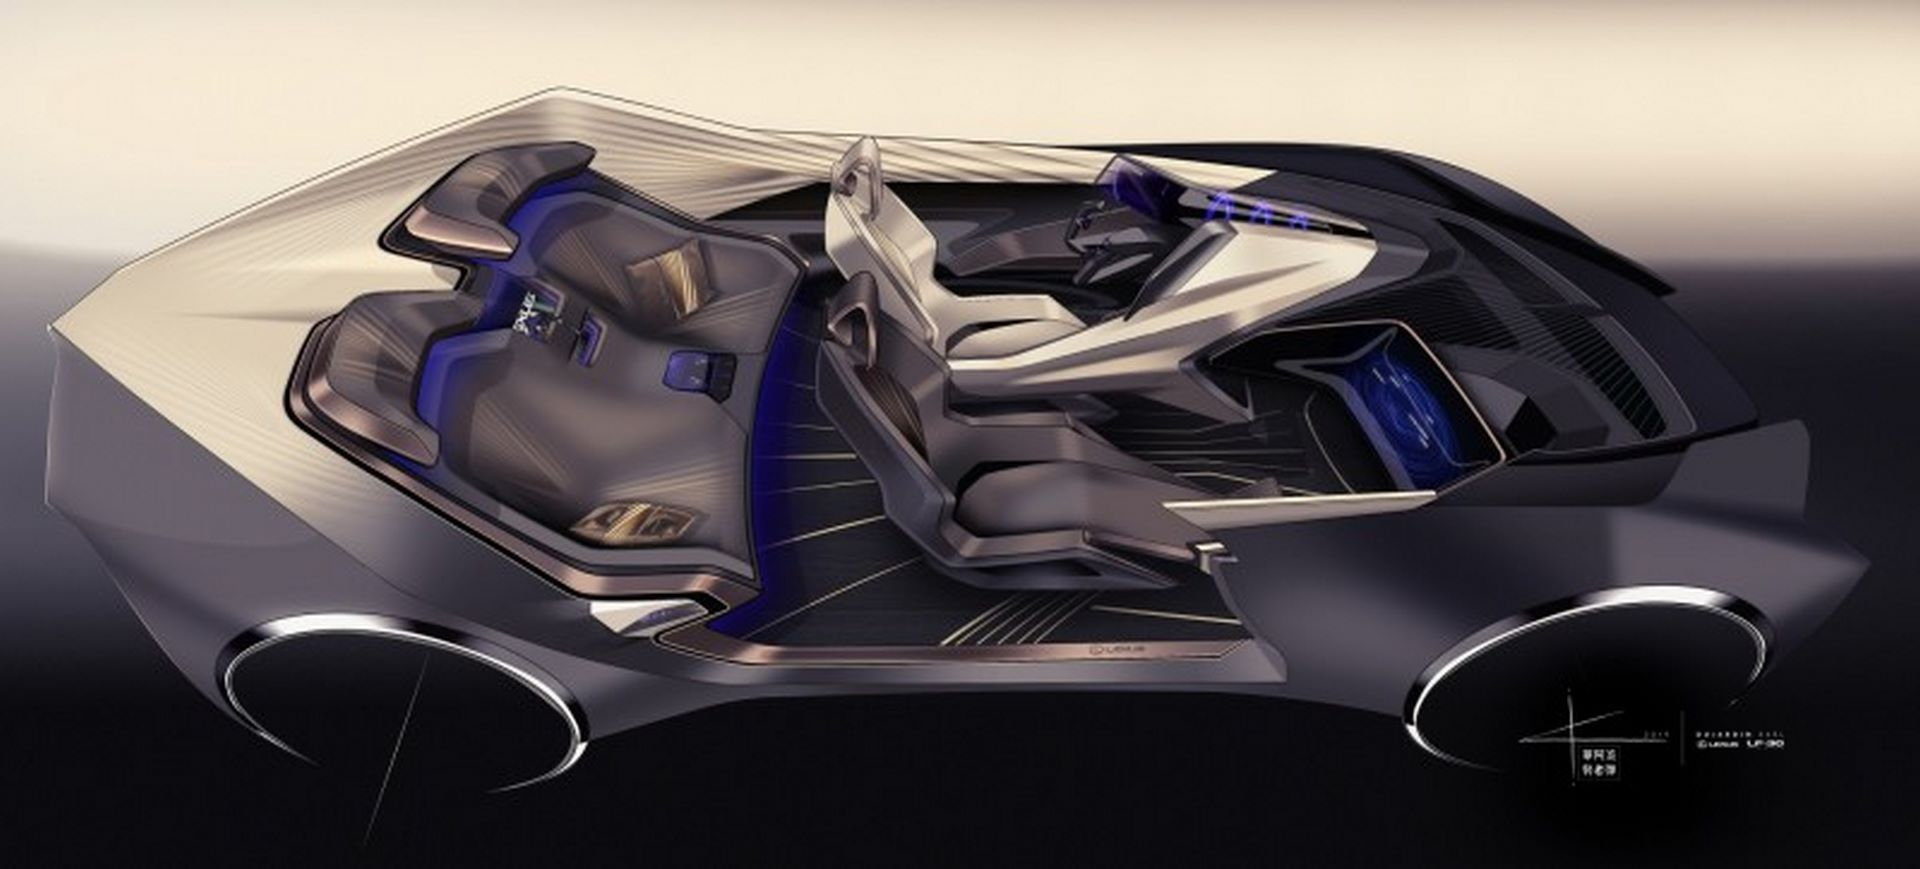 Lexus-LF-30-Concept-66